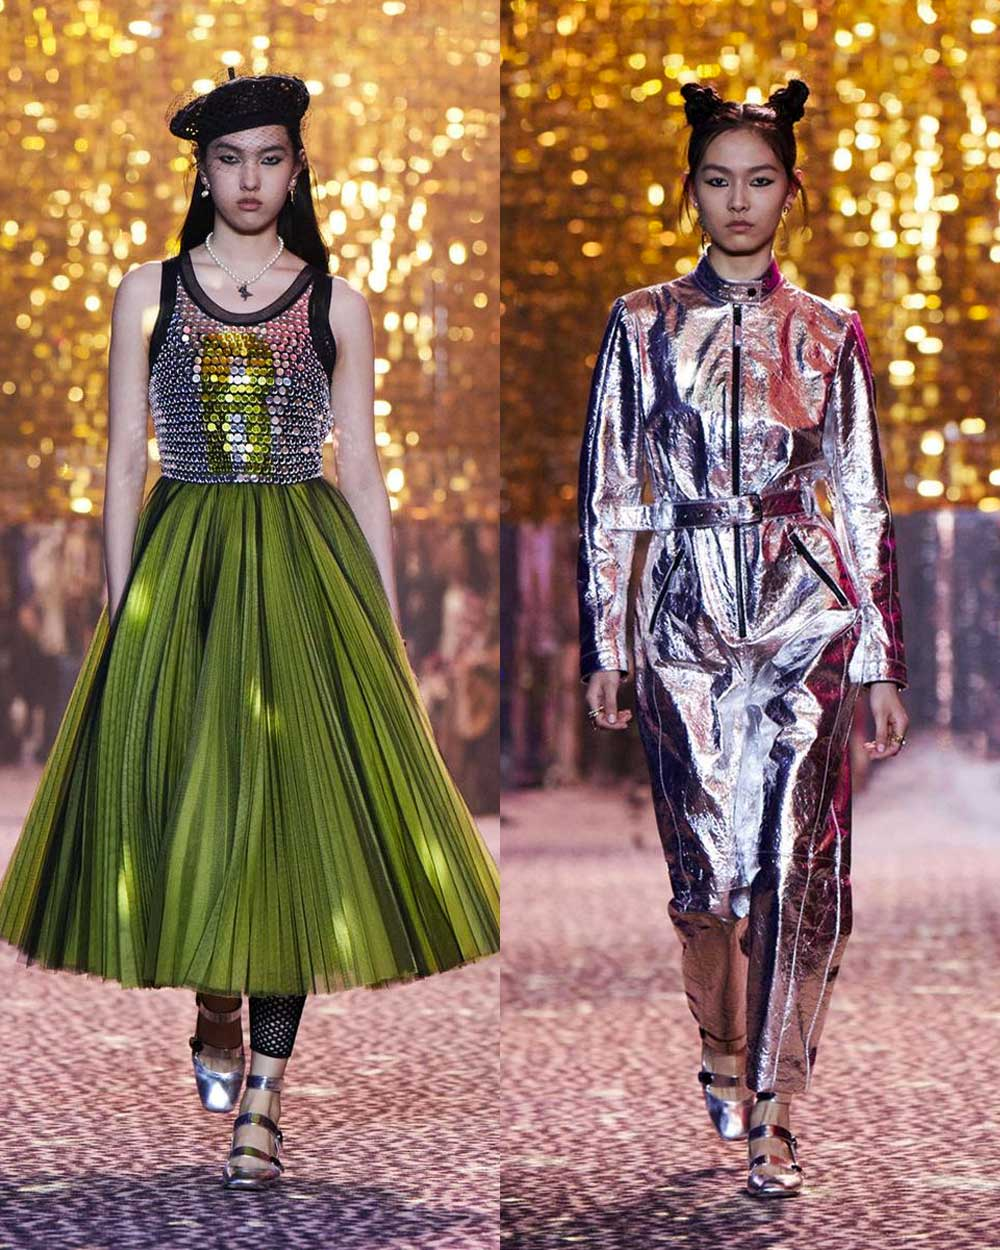 Dior pre-fall 2021 collection